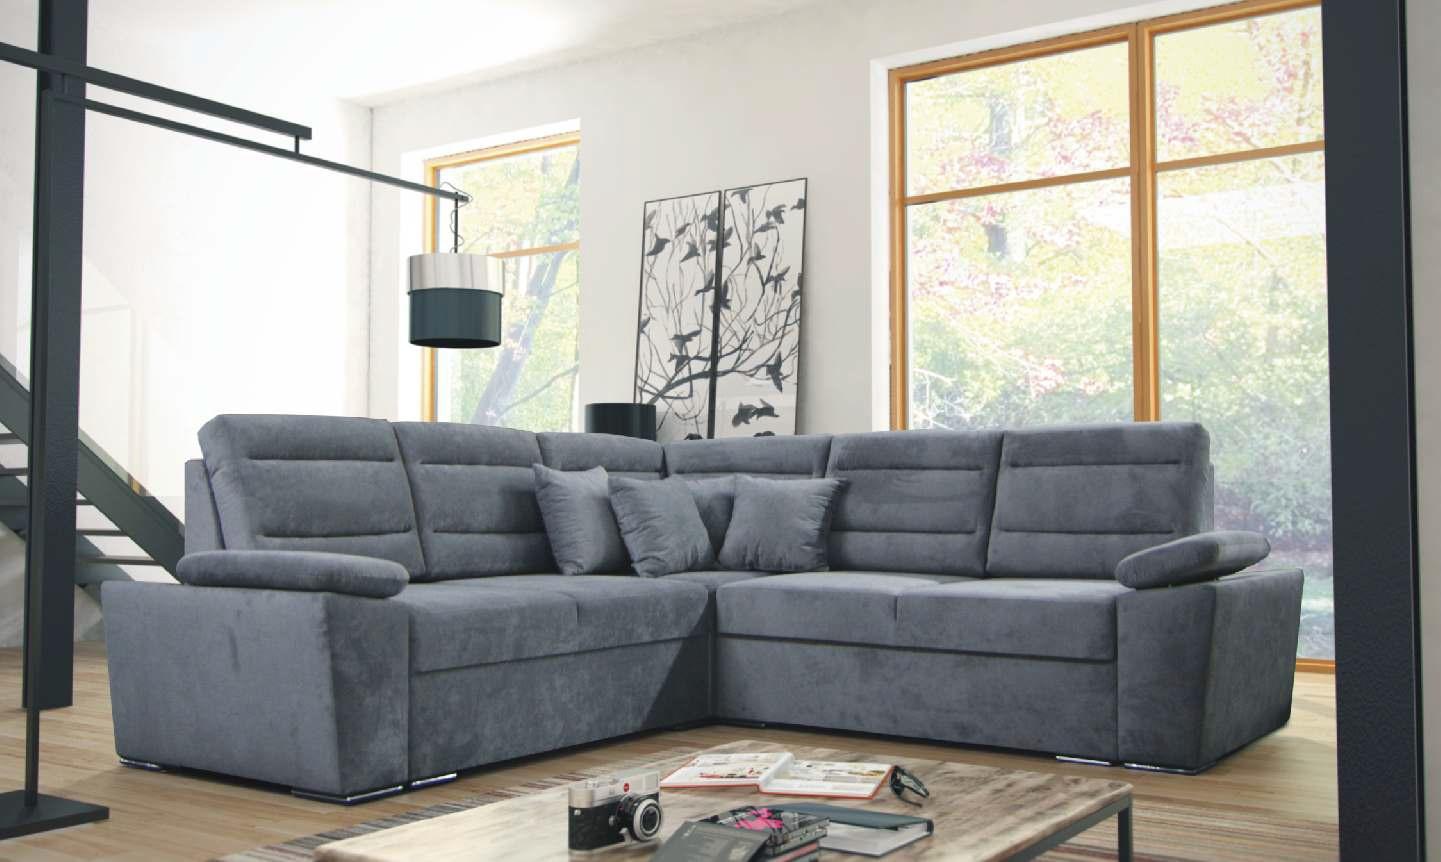 grey sectional sofa ideas best budget bed uk savio gray by skyler designs